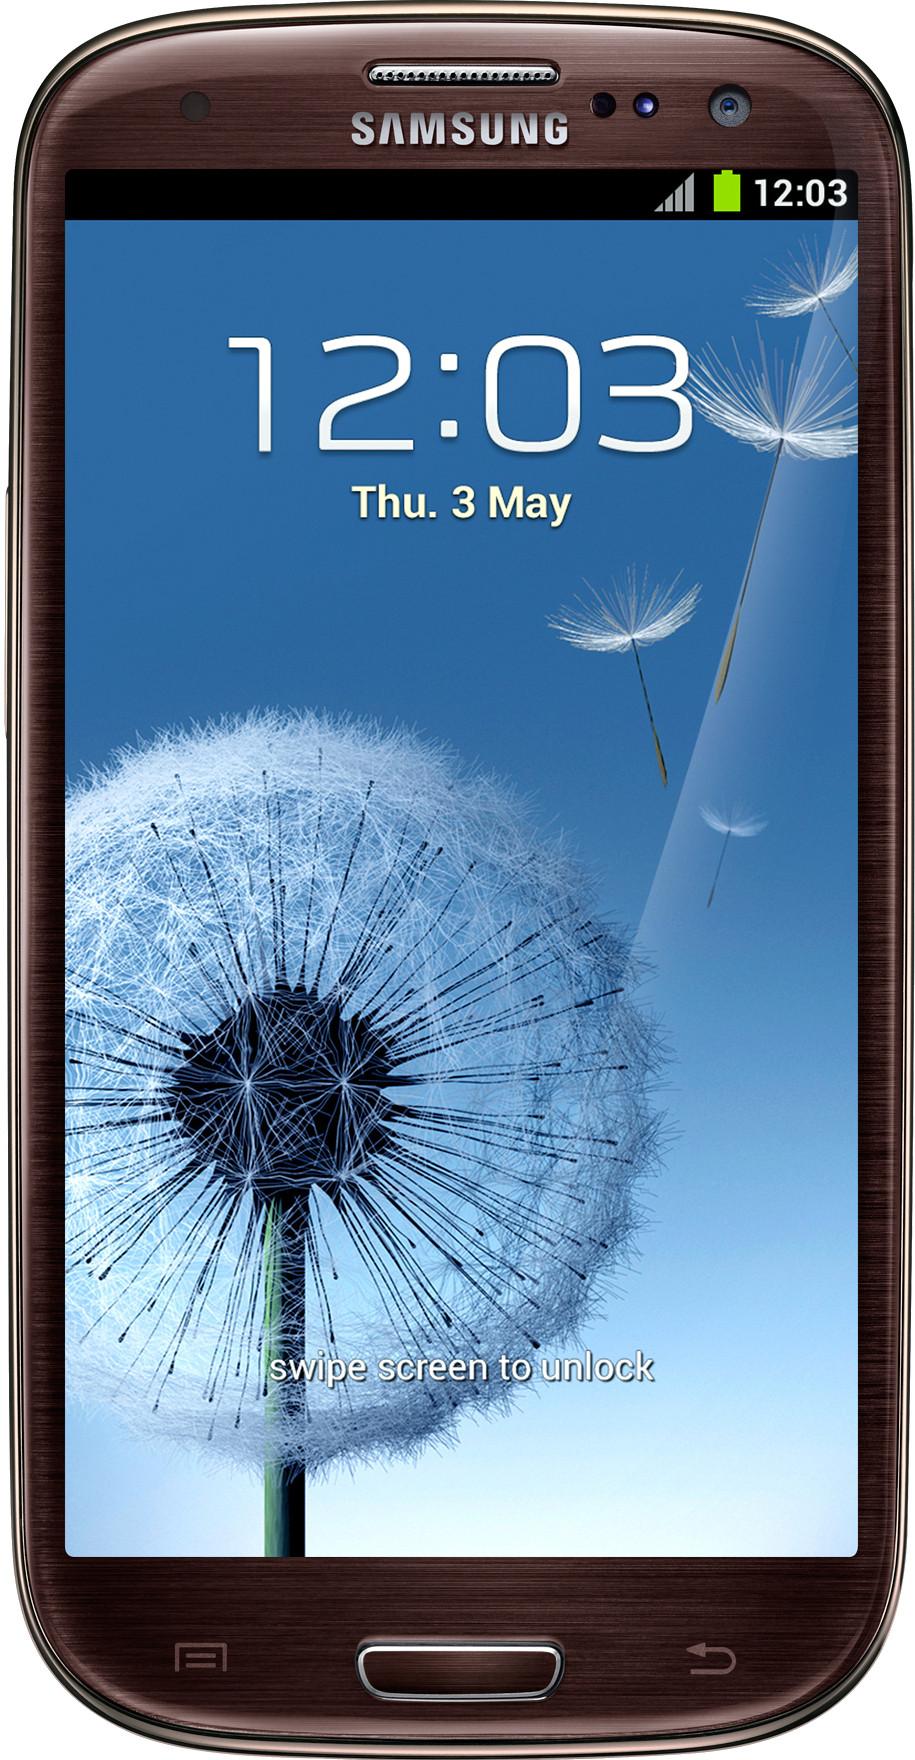 SAMSUNG Galaxy S3 Neo (Brown, 16 GB)(1.5 GB RAM)